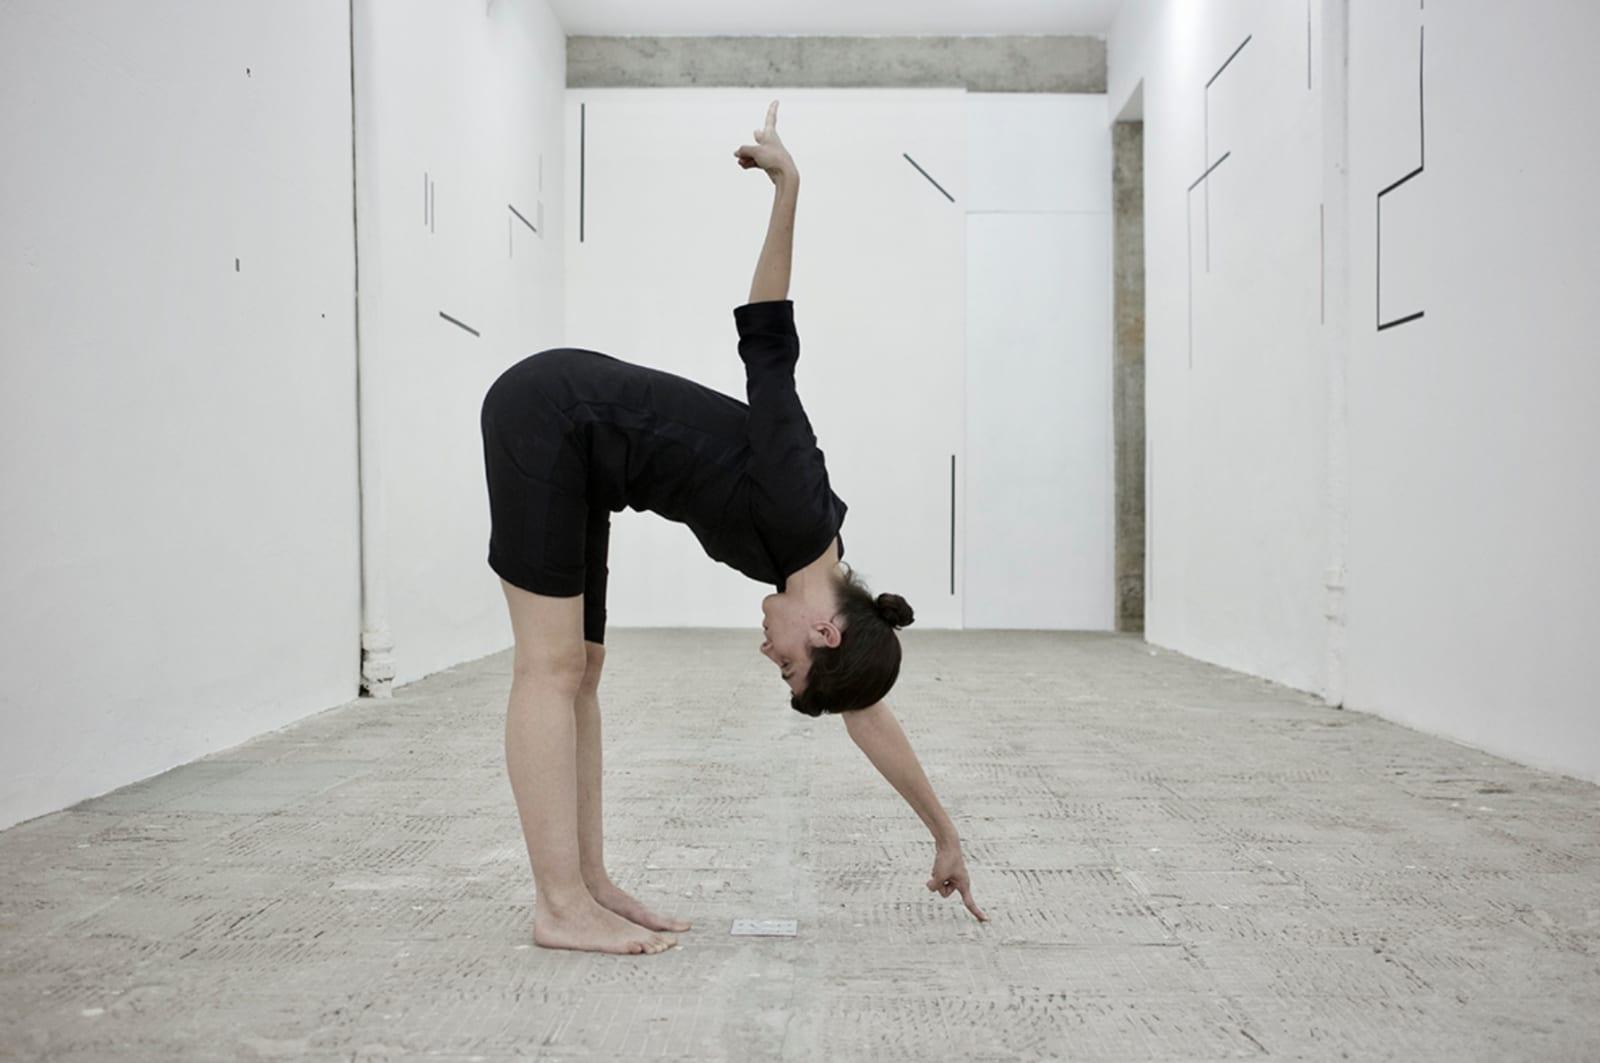 Maria Noujaim, Semicolon, 2018 performed at Galeria Jaqueline Martins, São Paulo, 2018